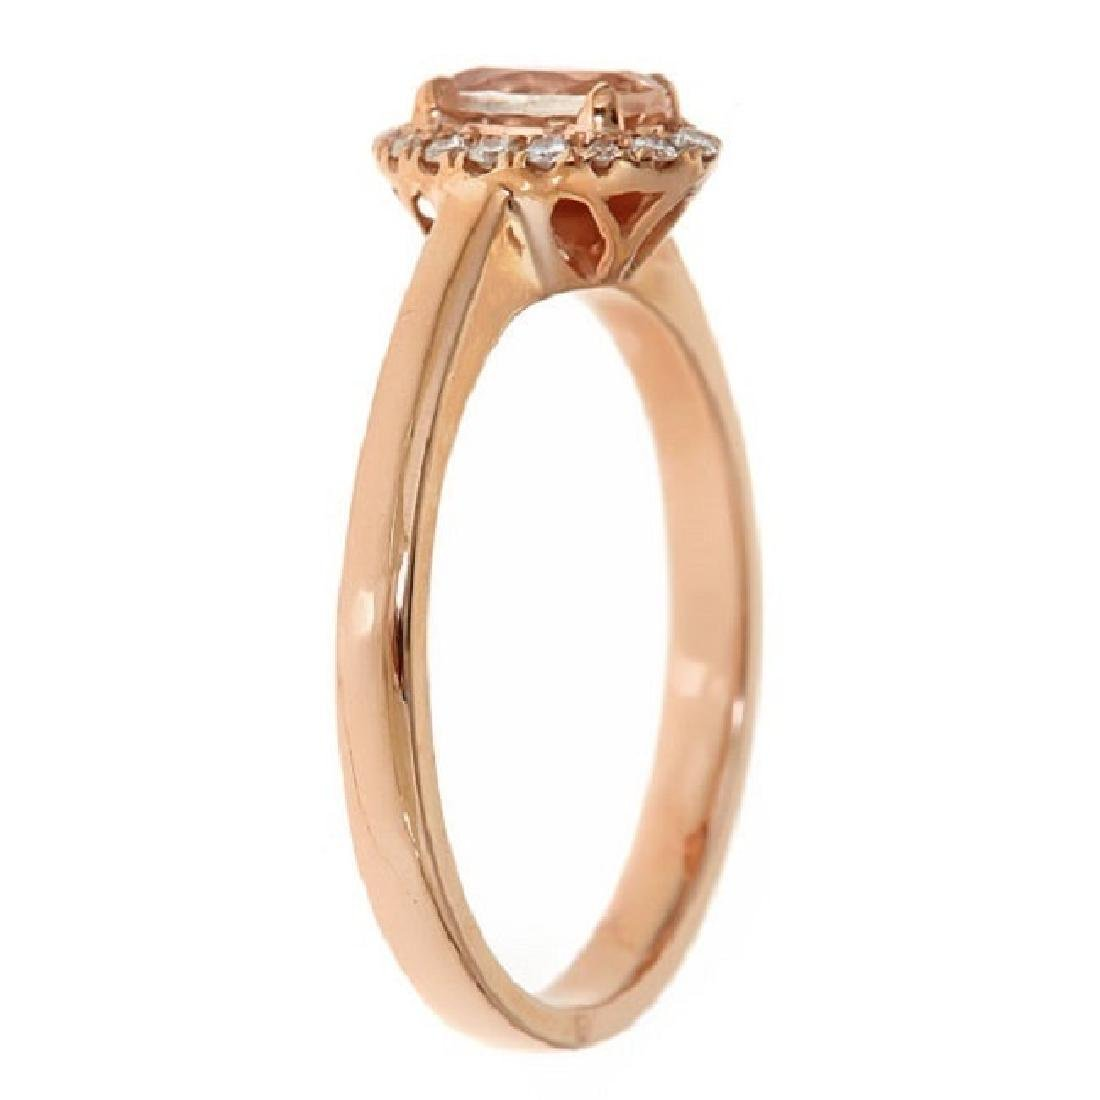 0.43 ctw Morganite and Diamond Ring - 10KT Rose Gold - 2